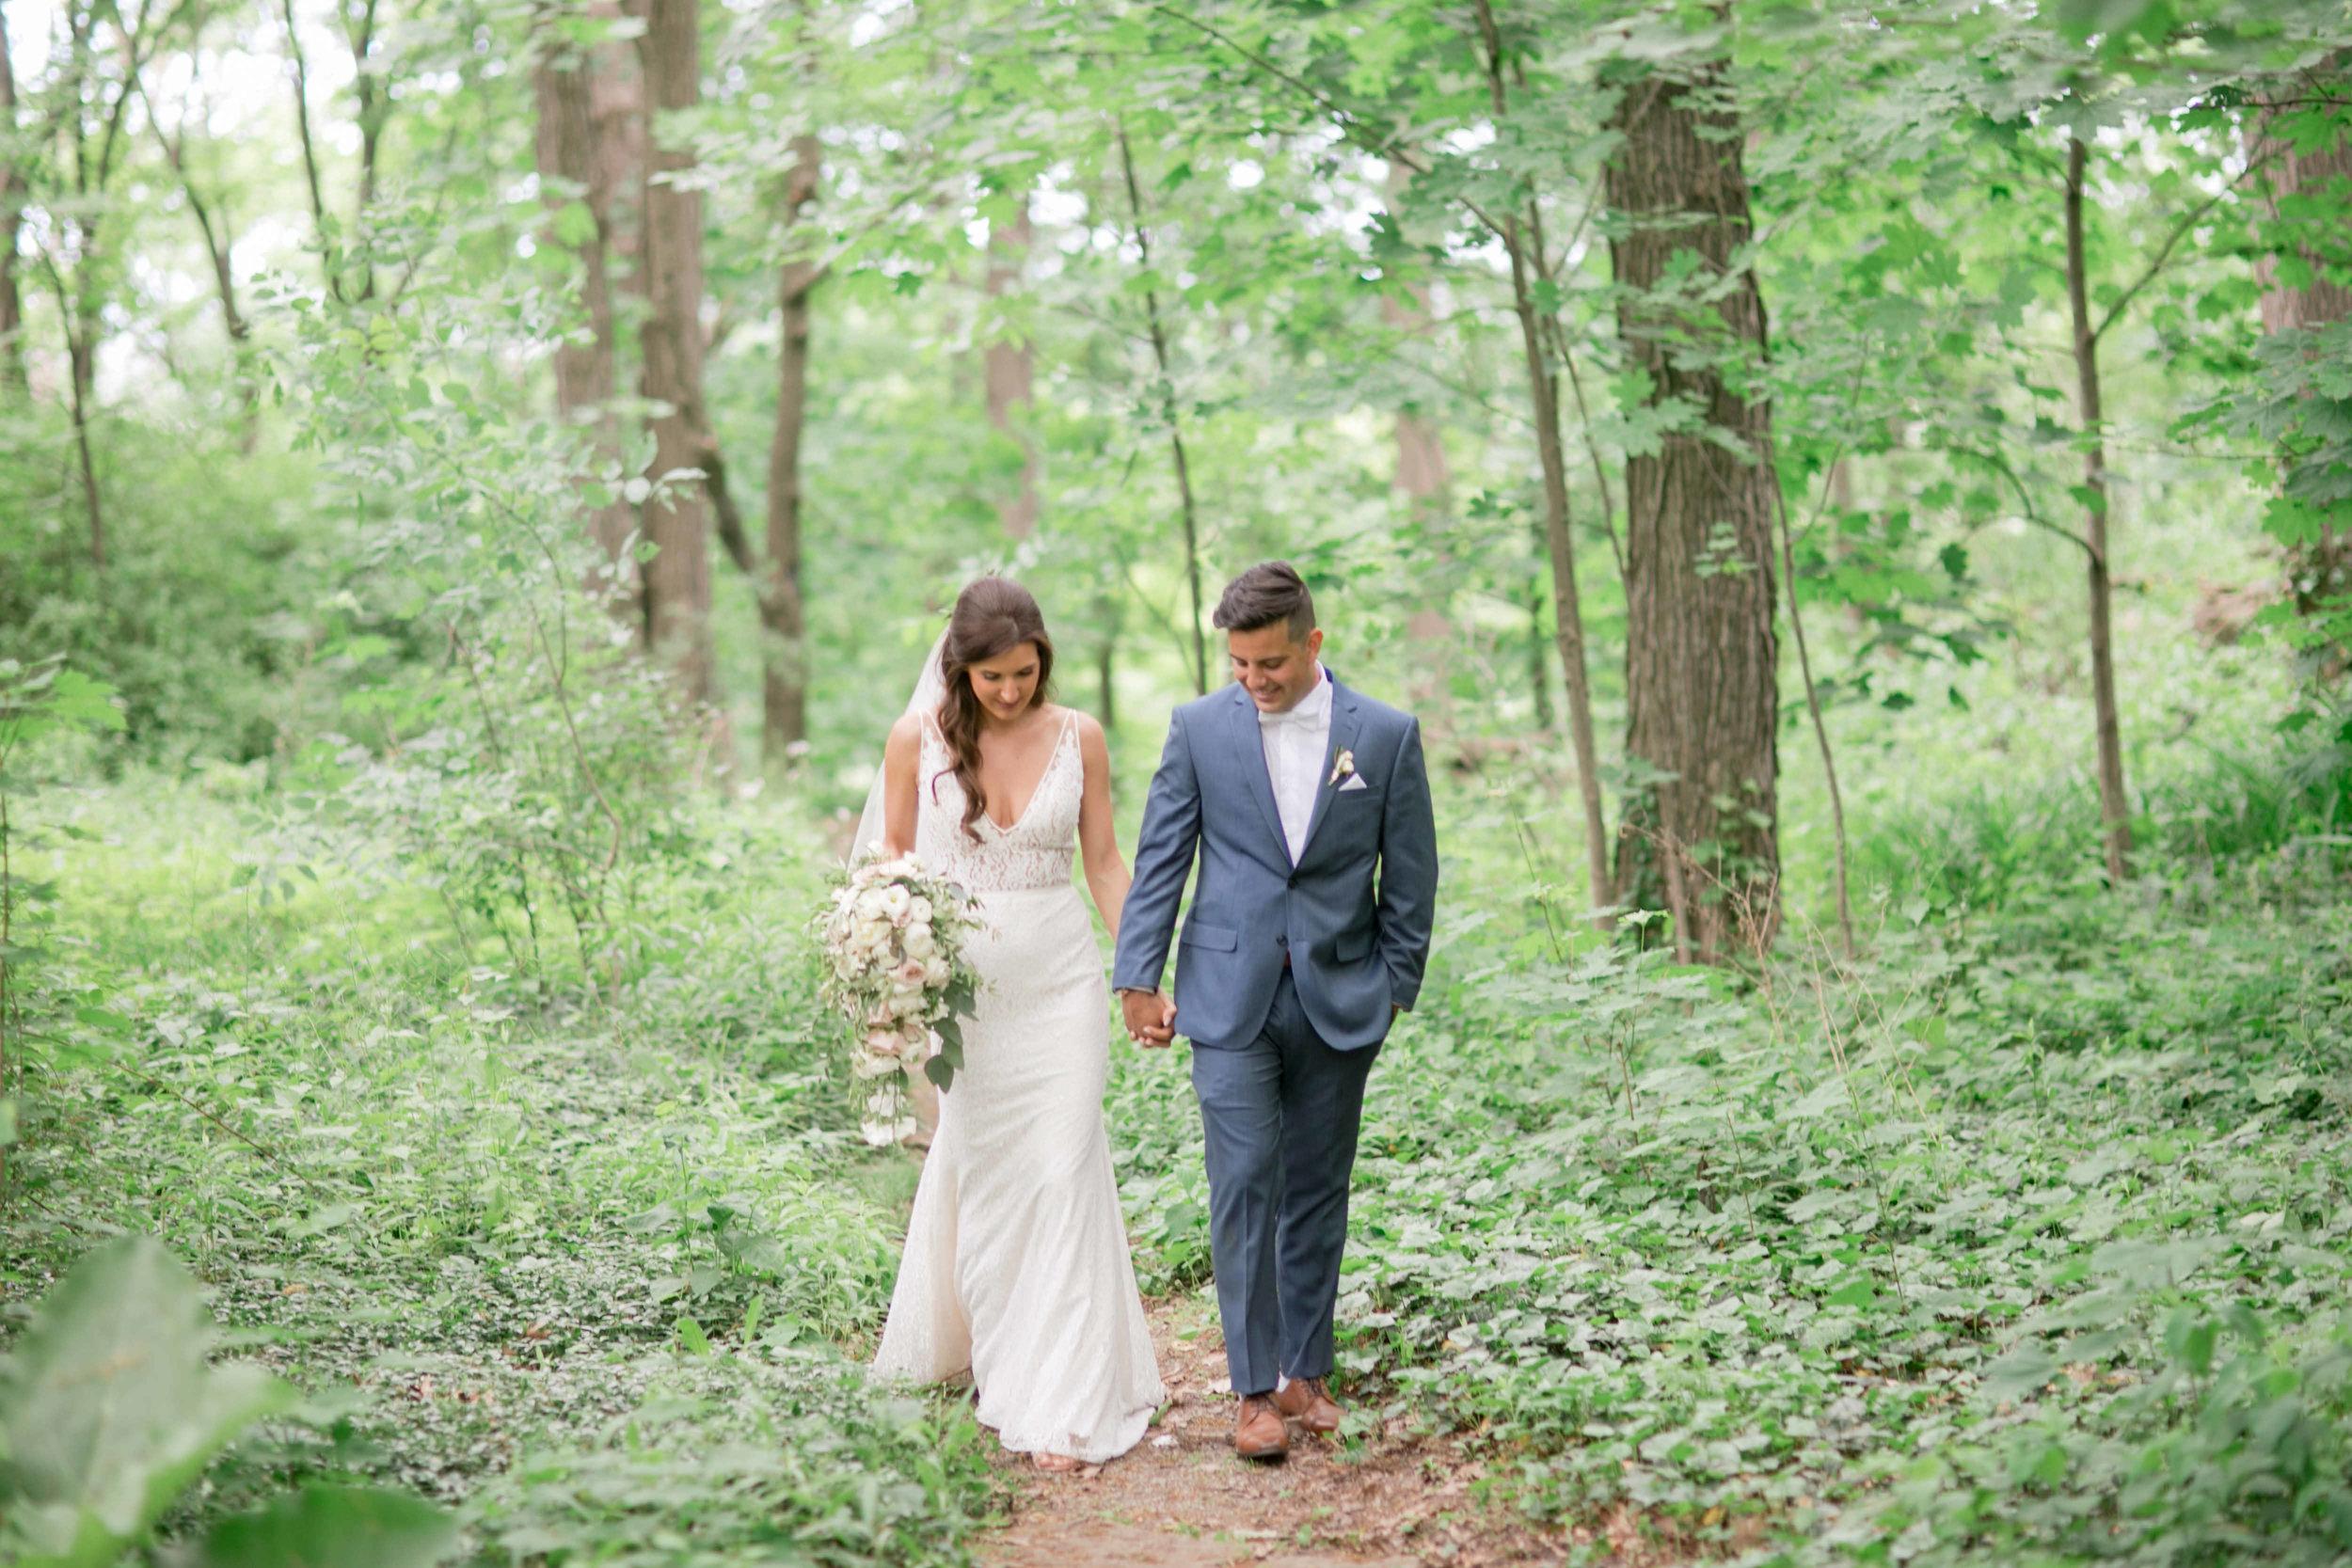 Miranda___Daniel___Daniel_Ricci_Weddings___High_Res._Finals_445.jpg